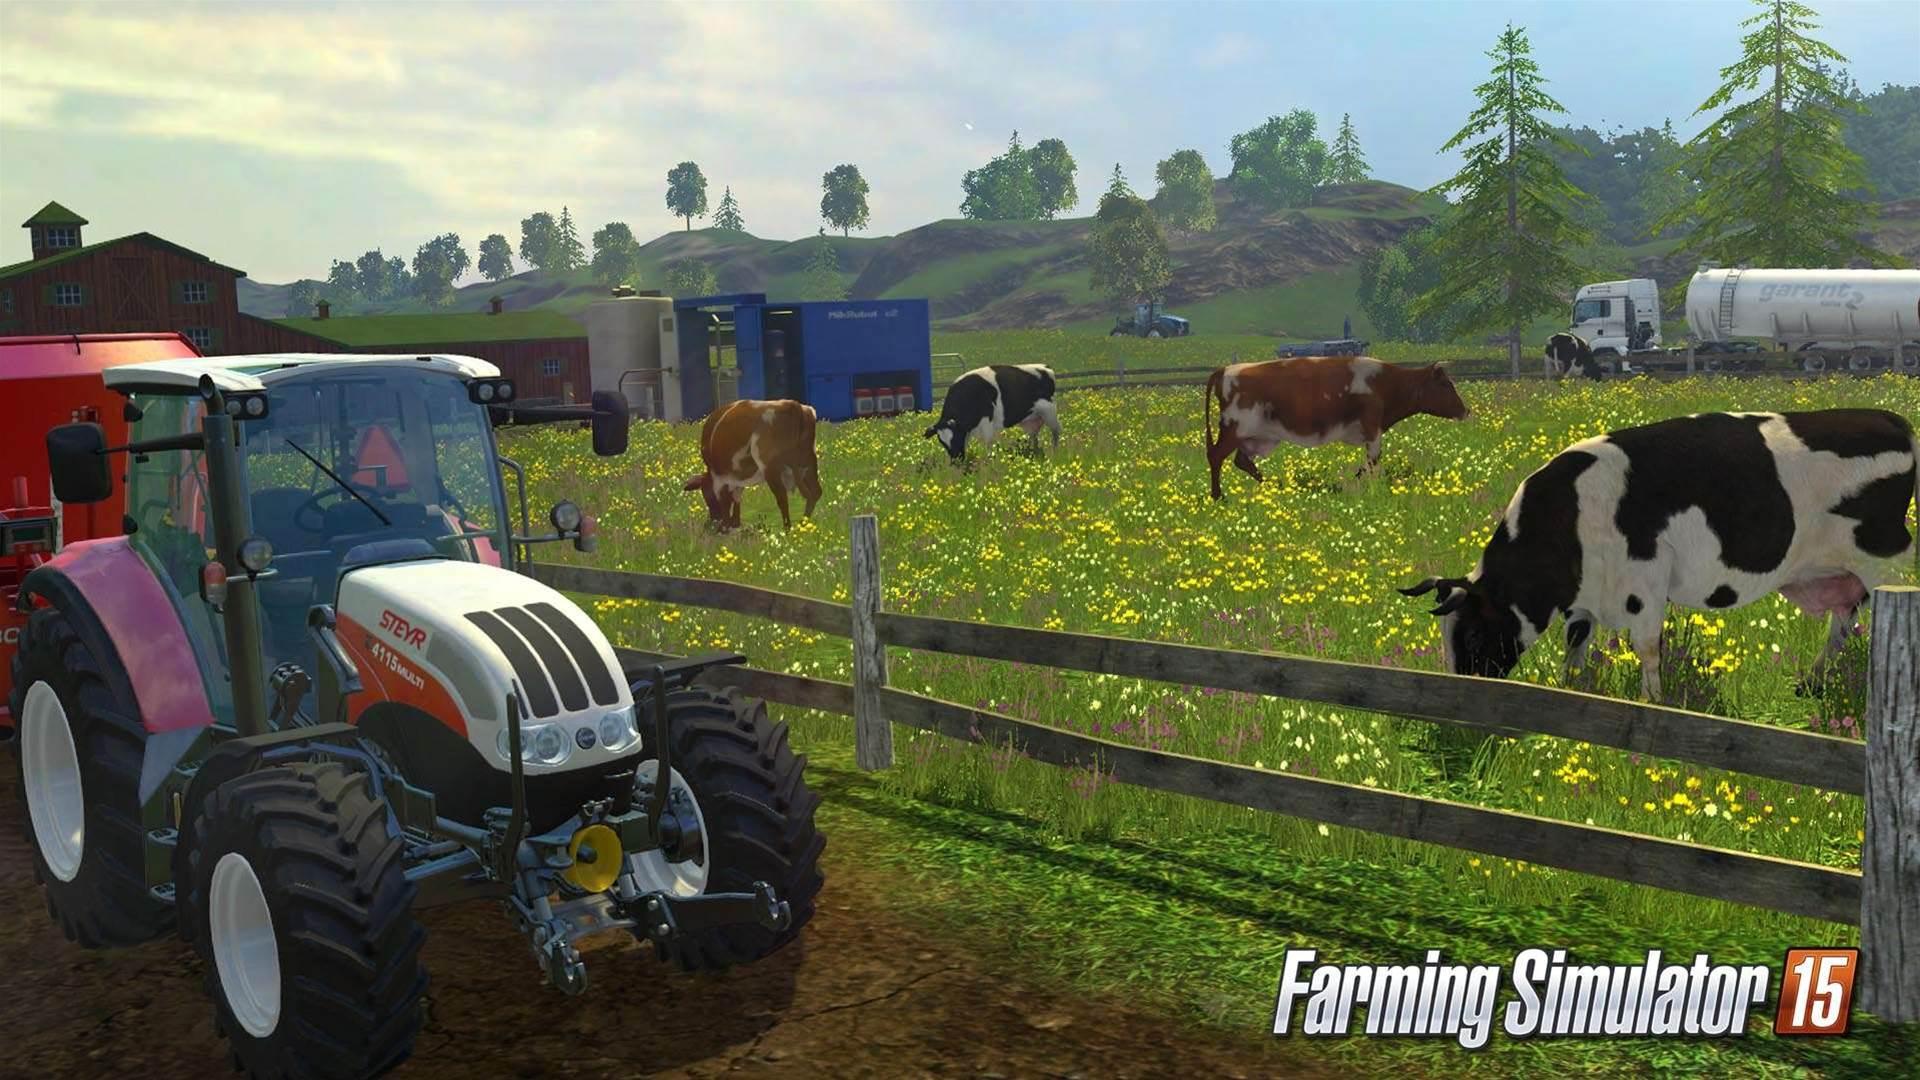 Farming Simulator 15 coming to consoles